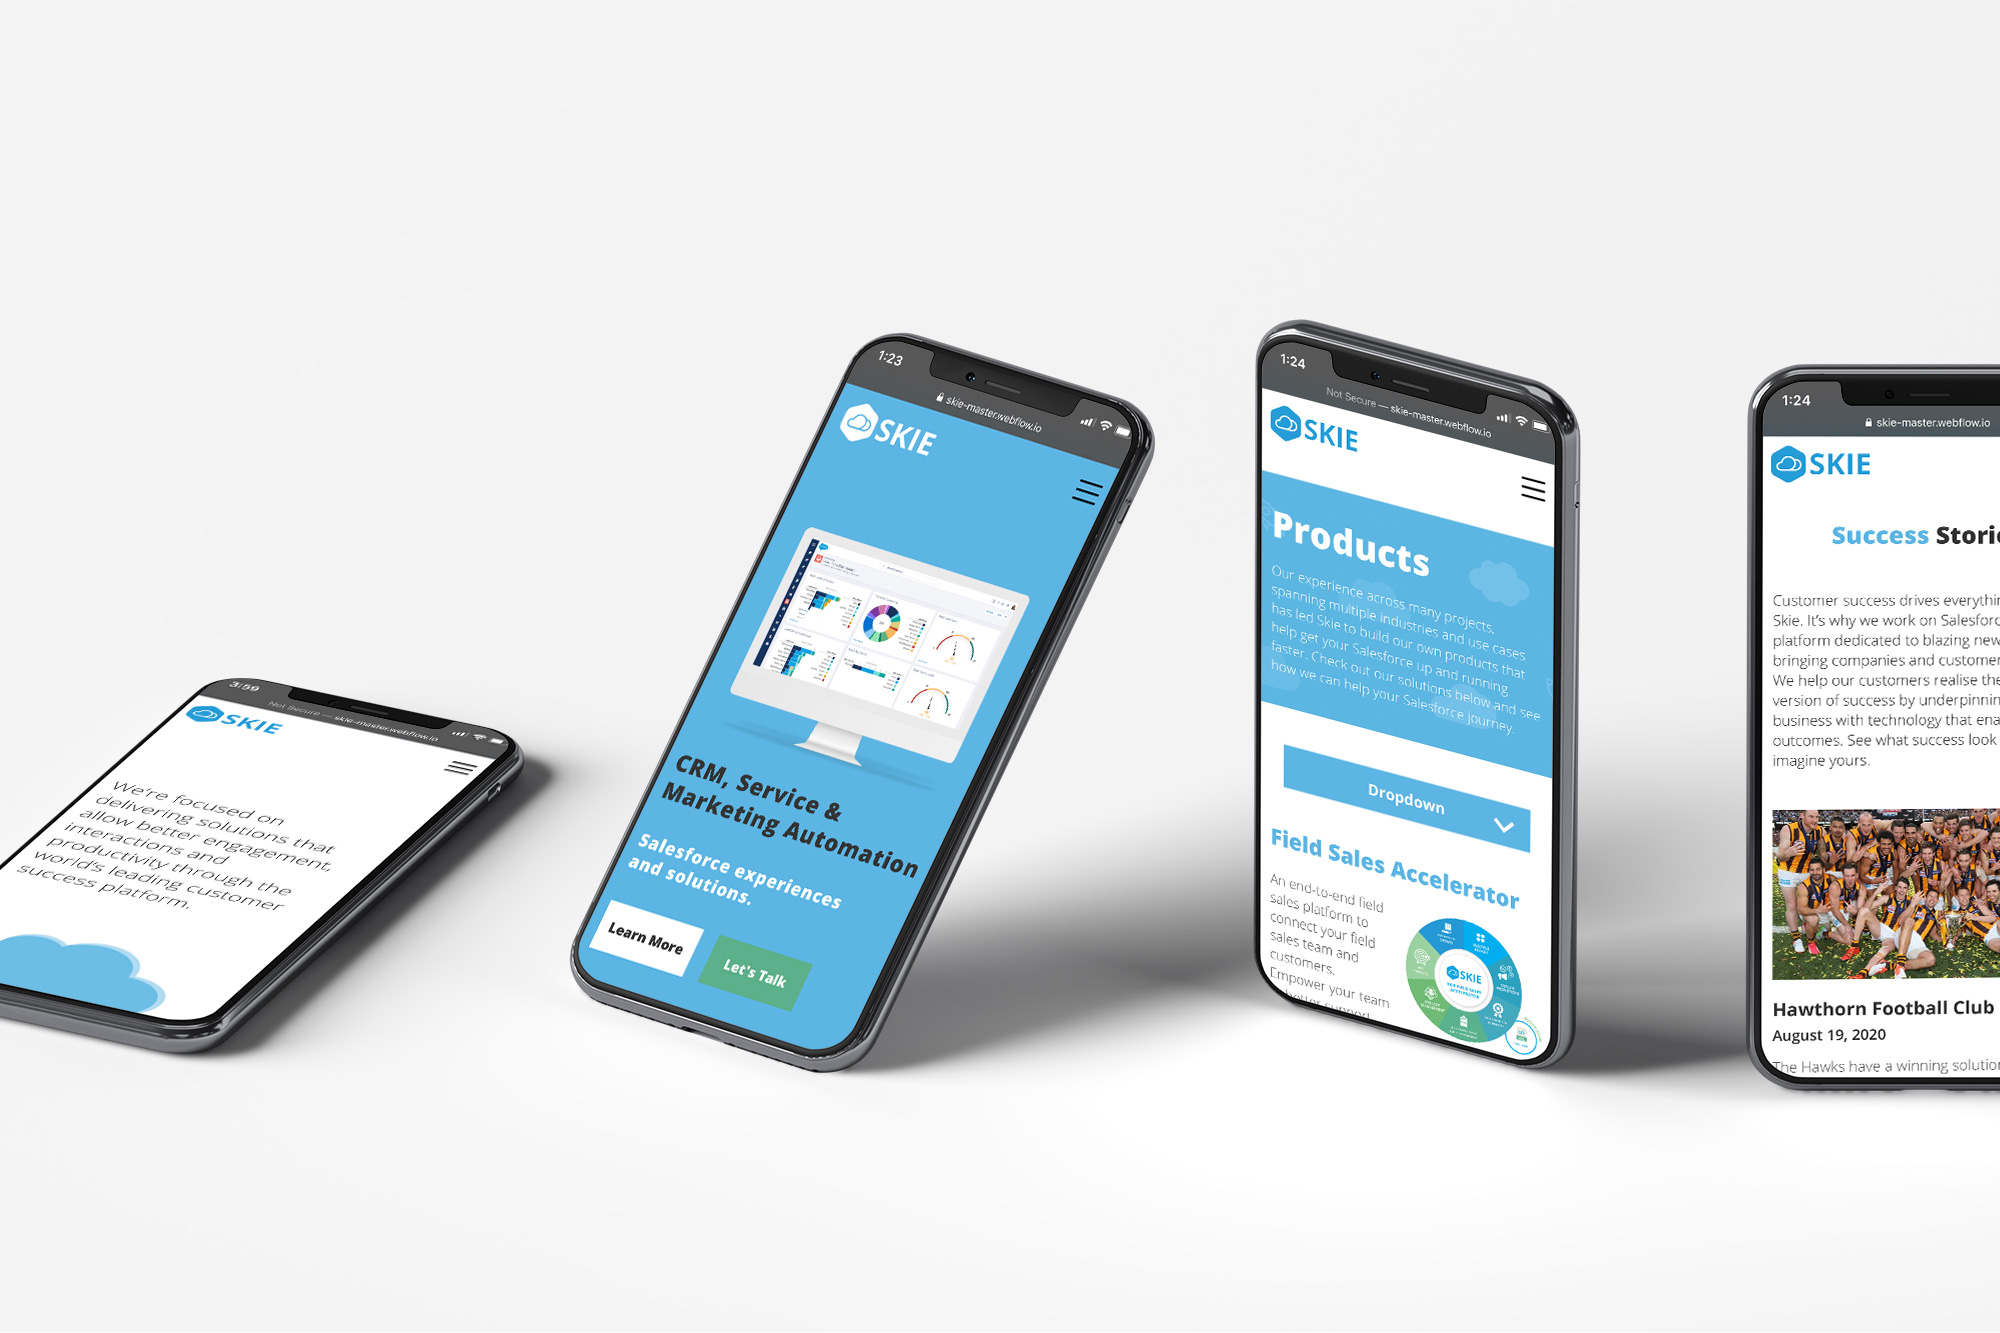 Skie website on four mobiles.